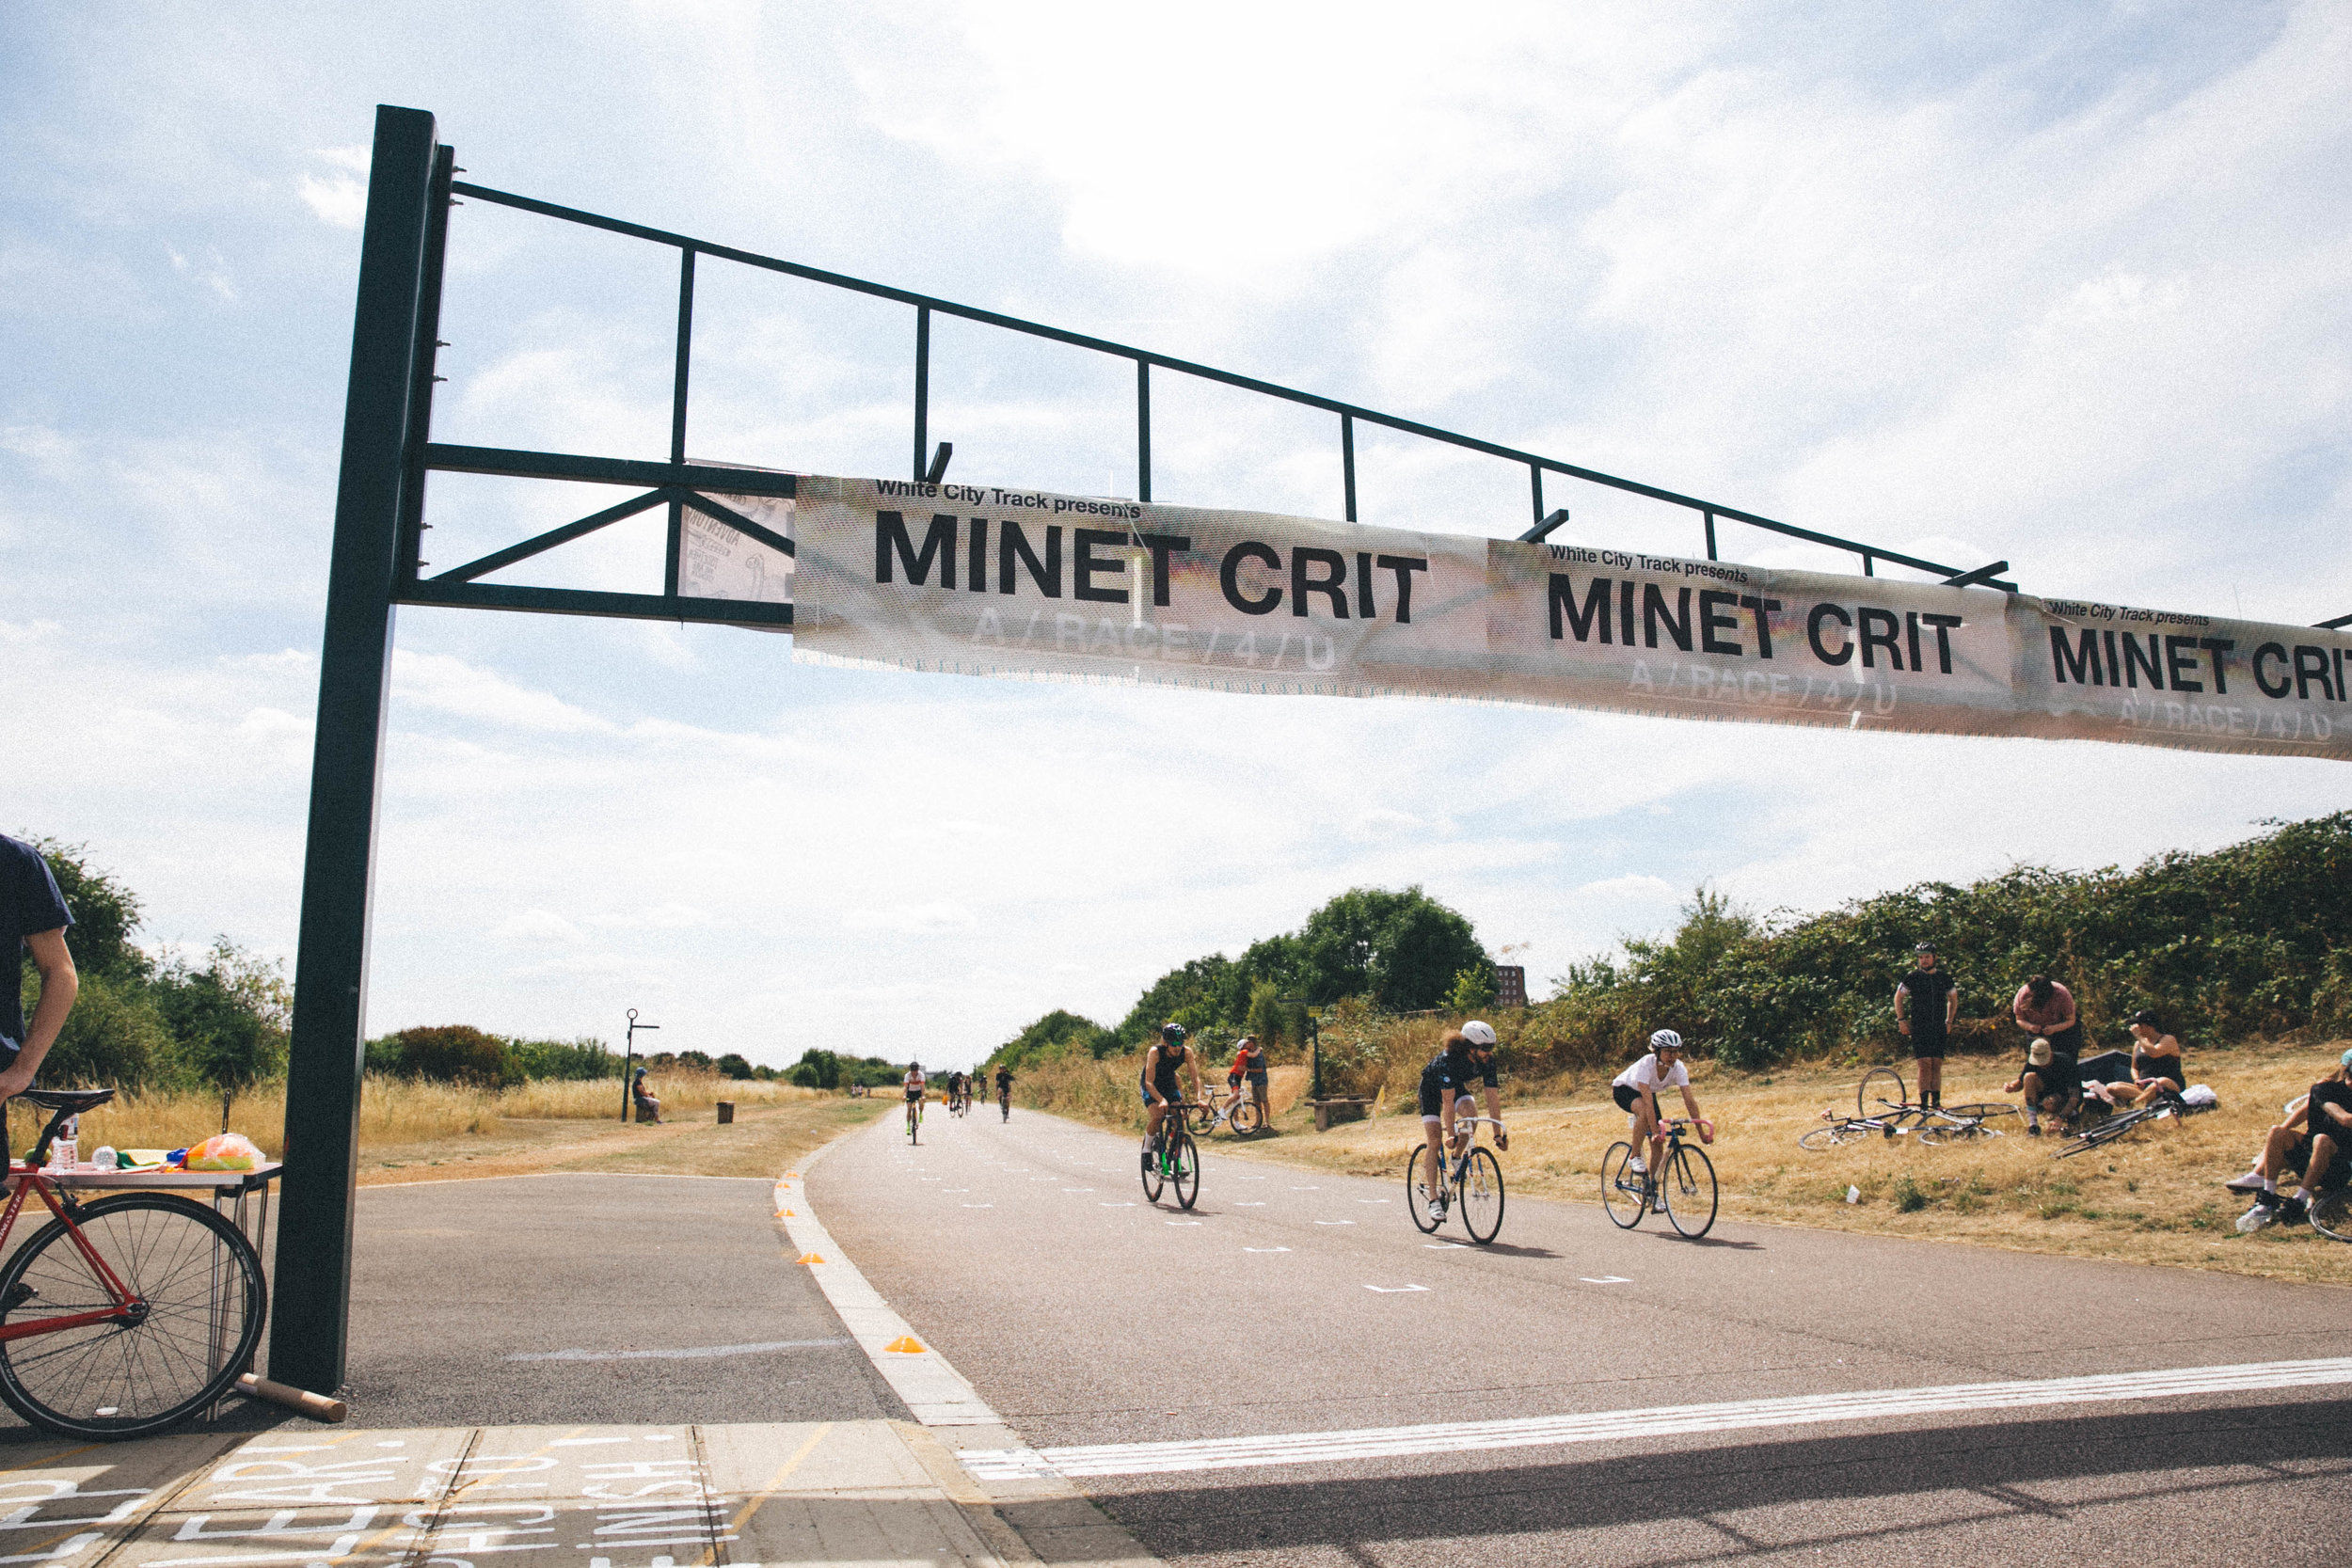 Minet Crit Start Line